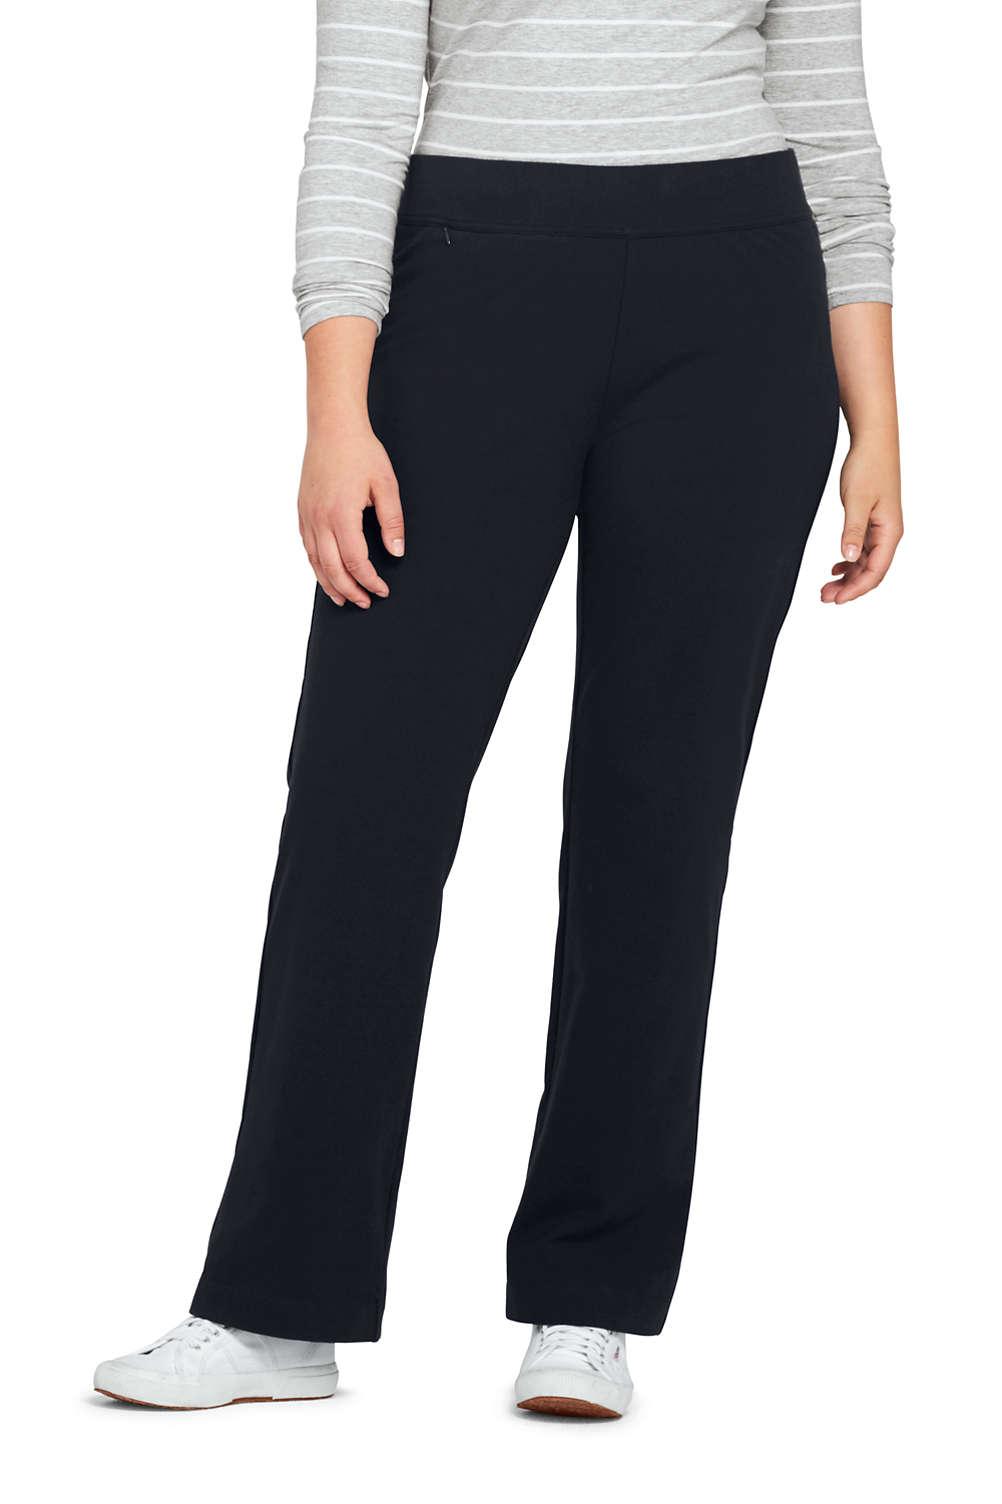 af11709b9d57c School Uniform Women s Plus Size Starfish Straight Leg Elastic Waist Pants  Mid Rise